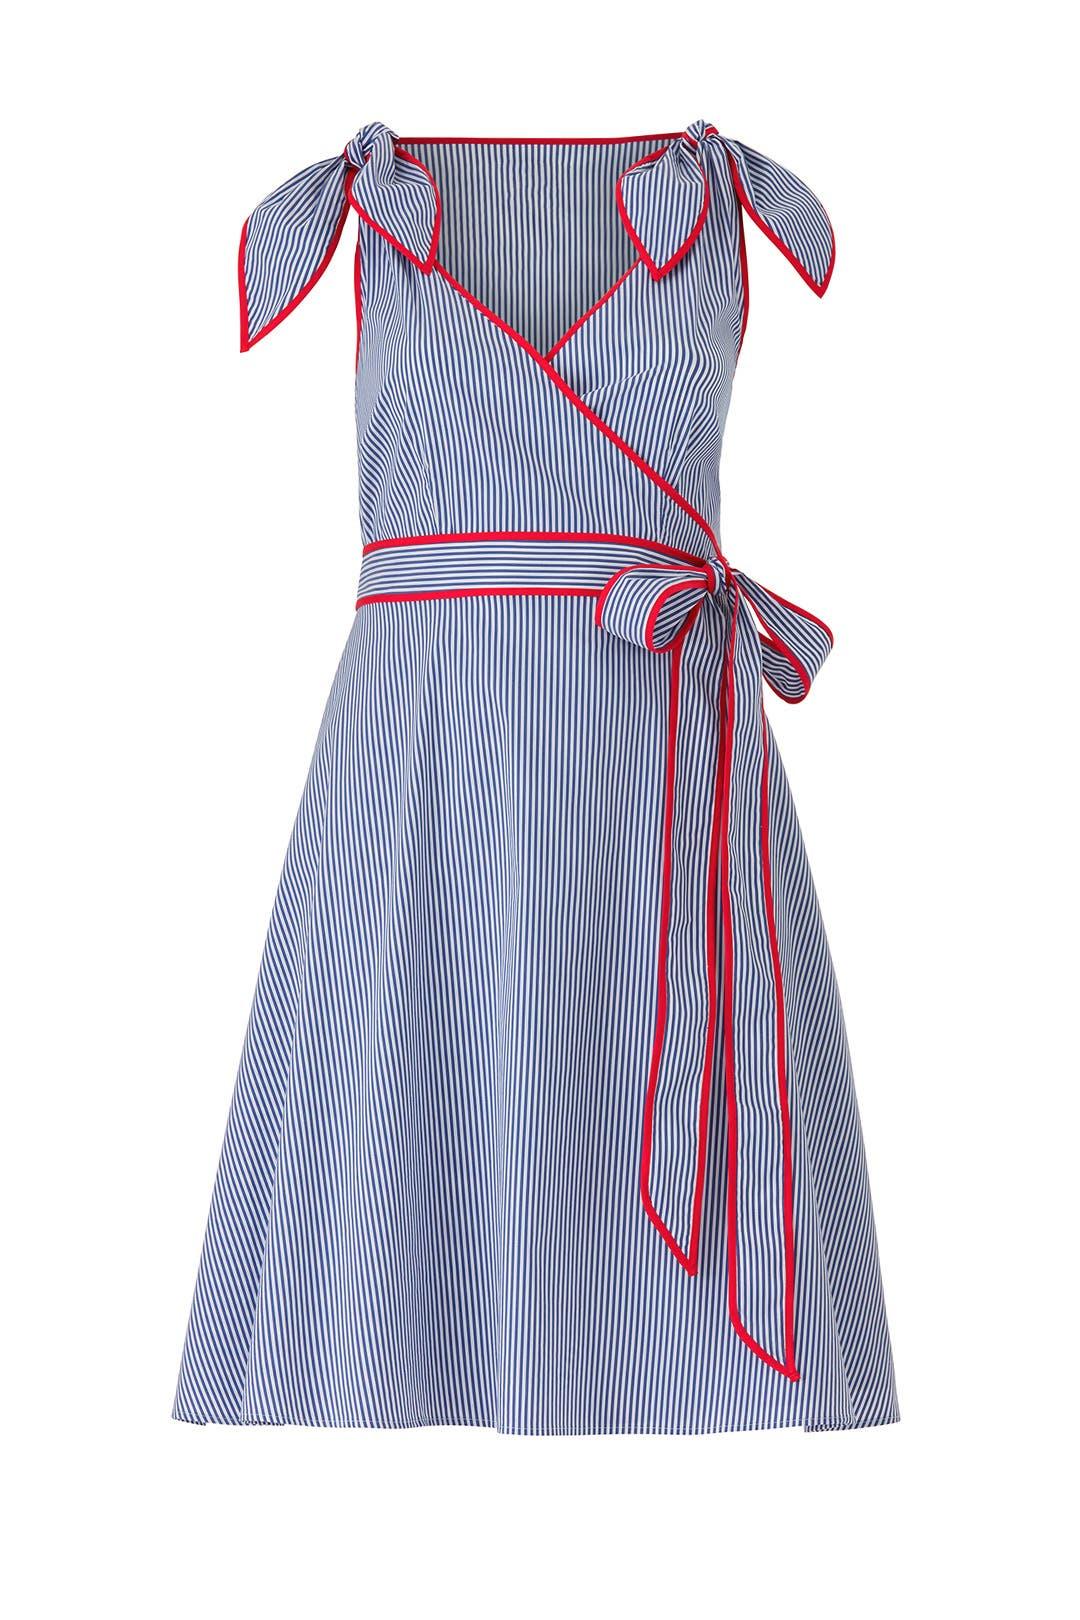 d5b2dca58f8 Stripe Wrap Dress by Draper James X ELOQUII for  30